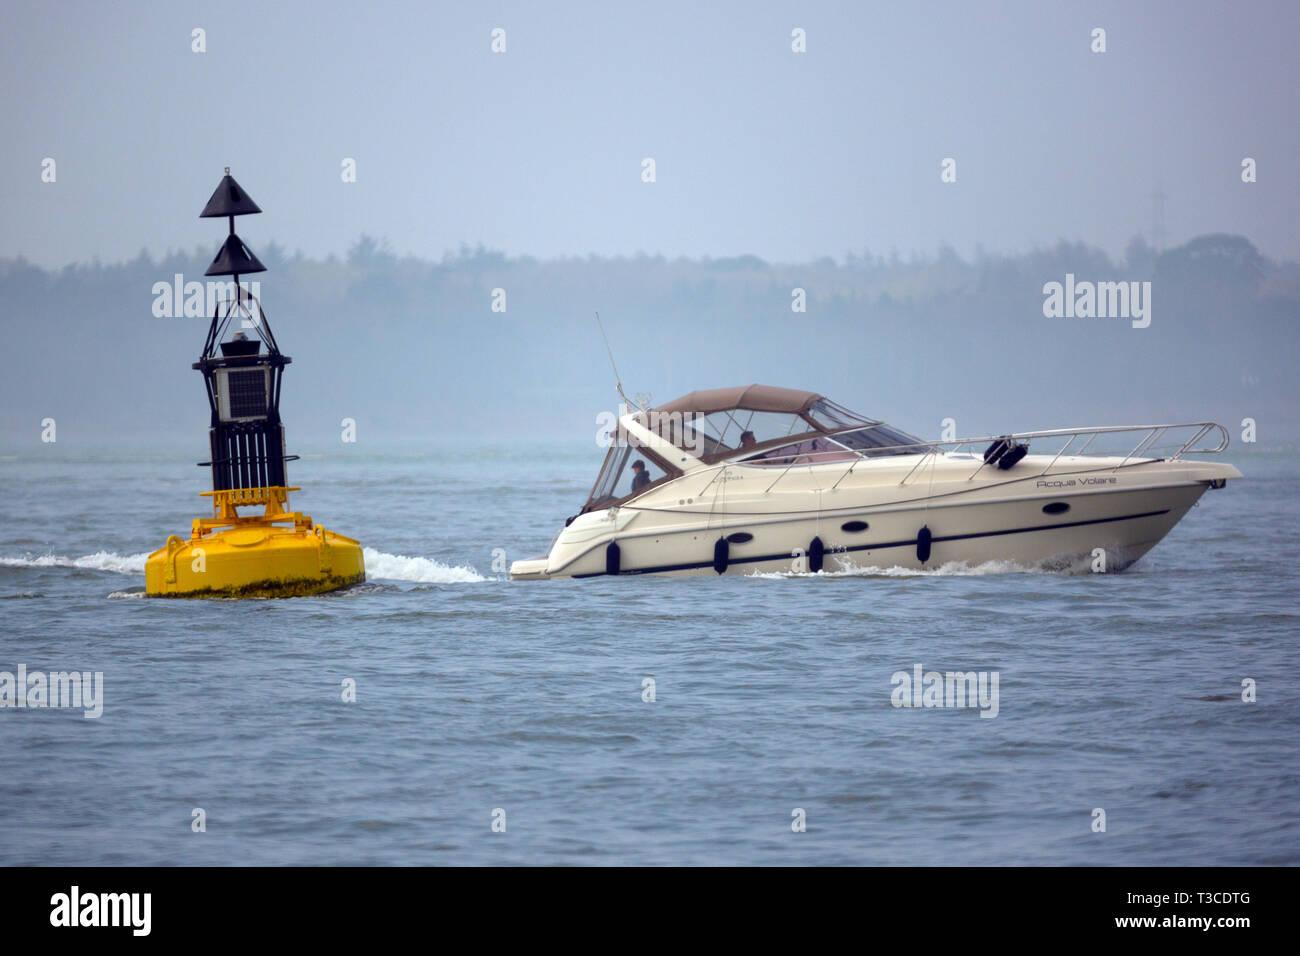 luxury,cruiser,boat,motor,gin,palace,power,training,RYA,handling,course,The Solent,Cowes,Isle of Wight,England,UK, - Stock Image